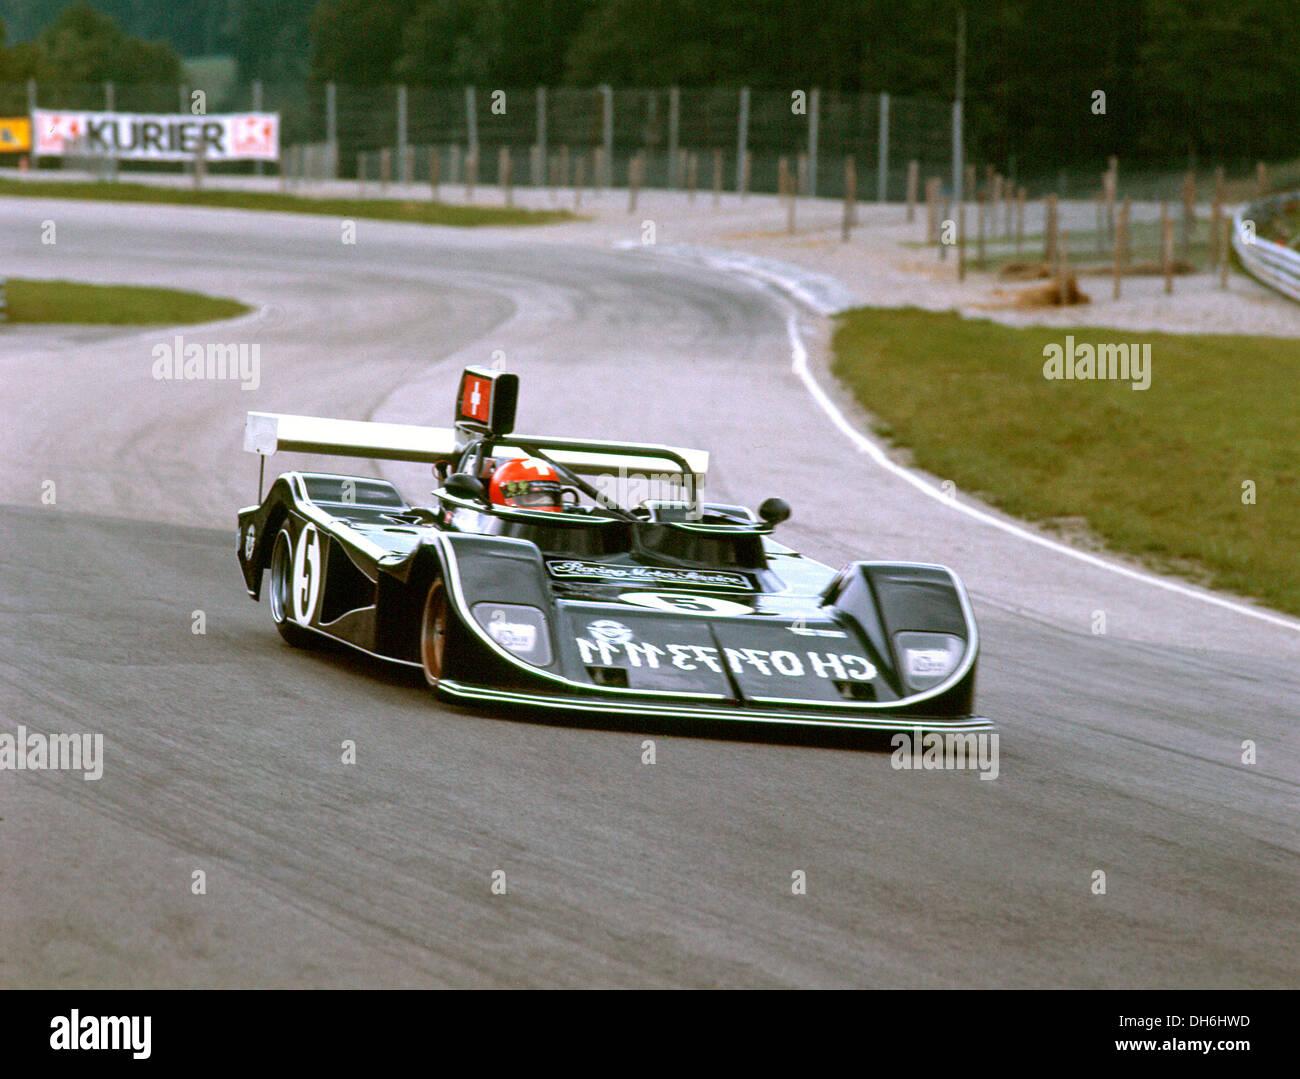 Herbert Muller Drving März 75 s BMW. 5. auf dem Salzburgring belegte er den 18. September 1977. Stockbild